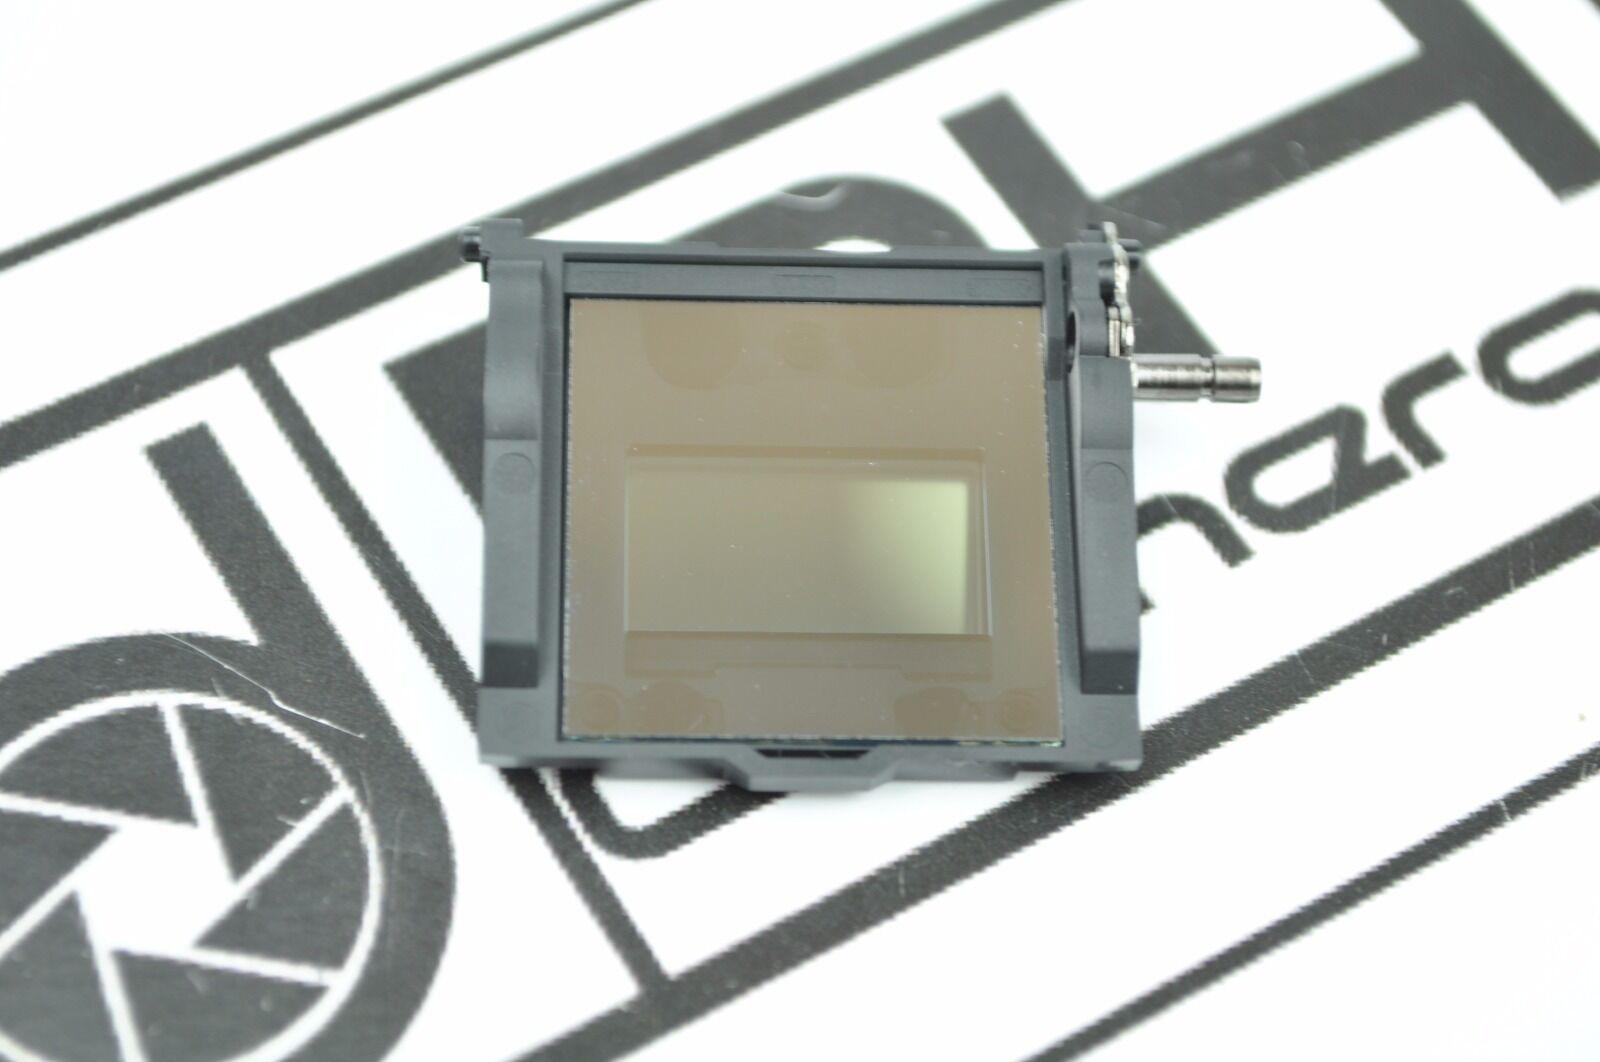 Reflective Lens For Sony Slt-a33 A35 A37 A55 A57 A58 A65 ...